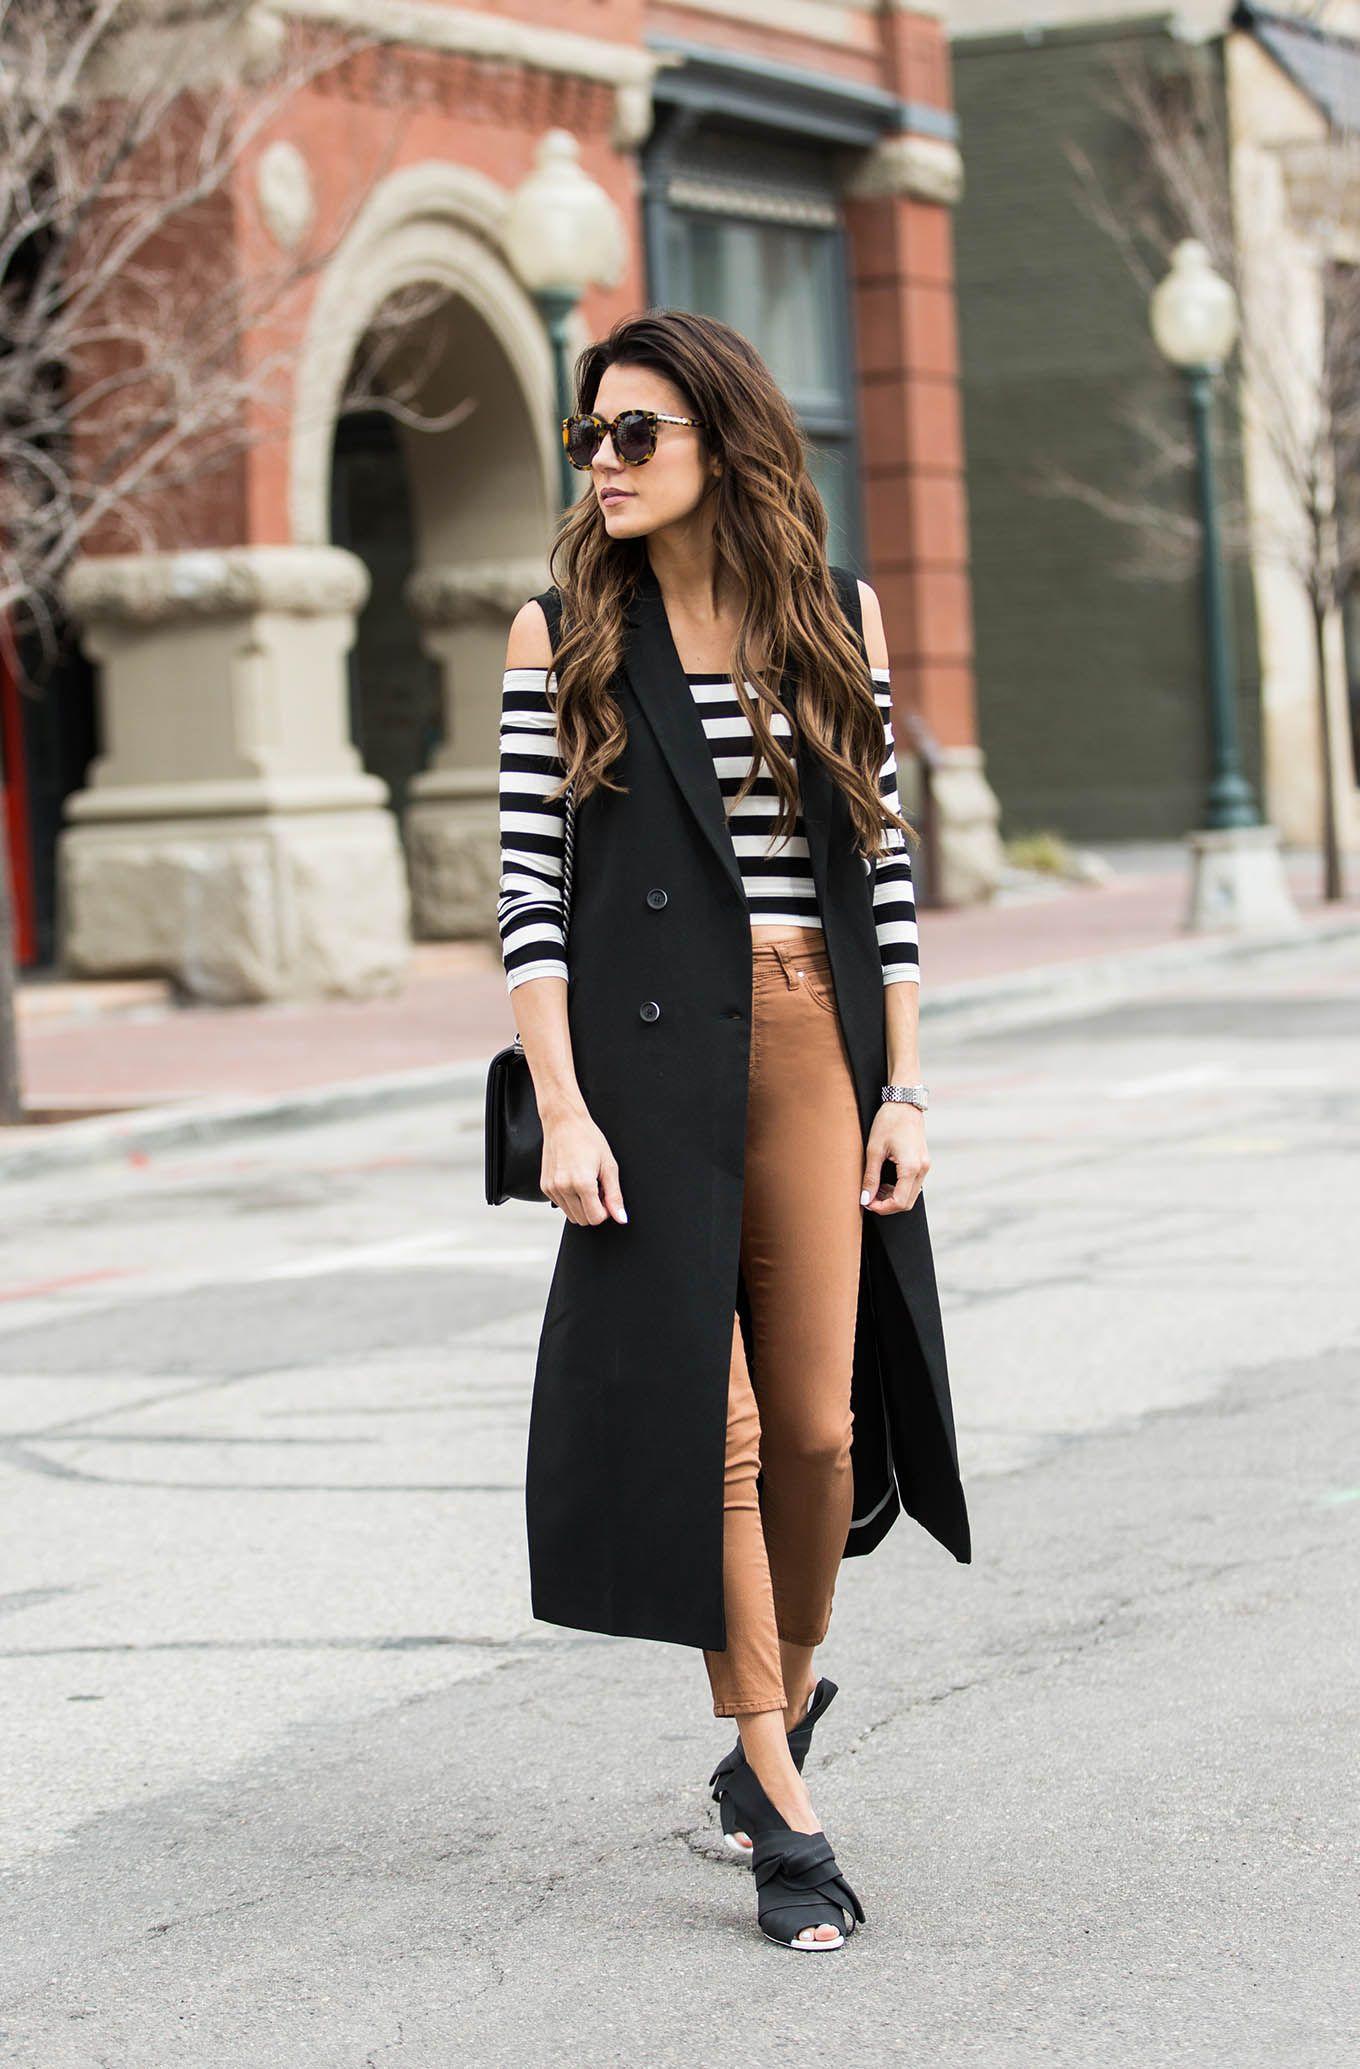 45 Best Shopping? images | Shopping, Women, Fashion